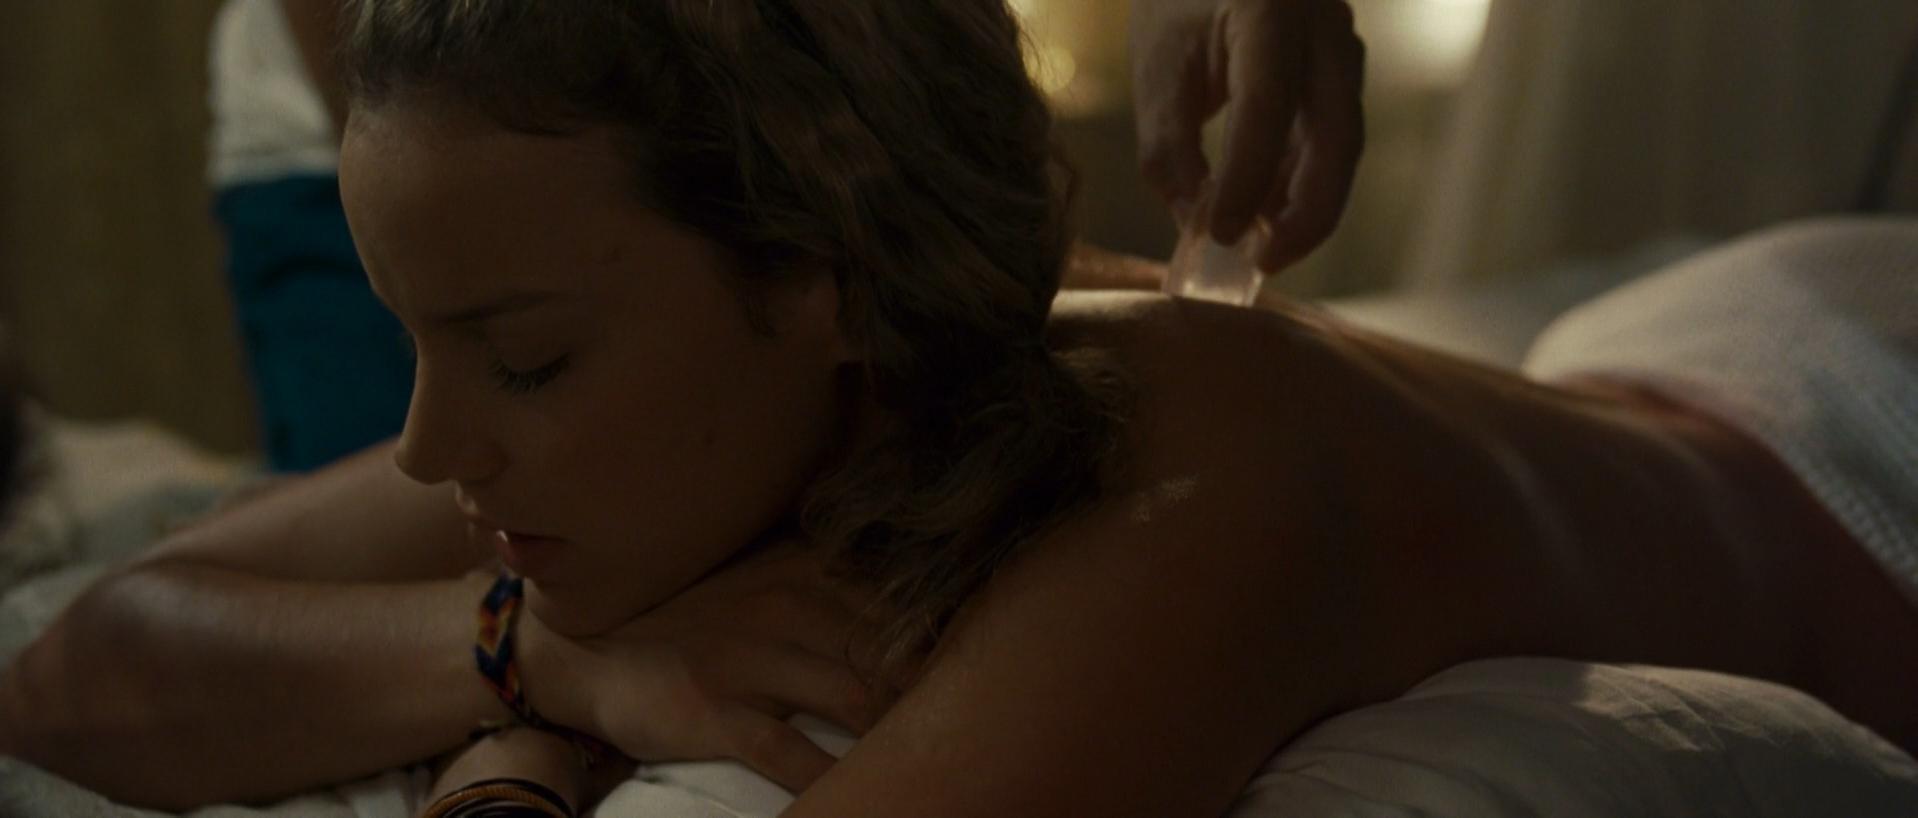 abbie cornish nude video